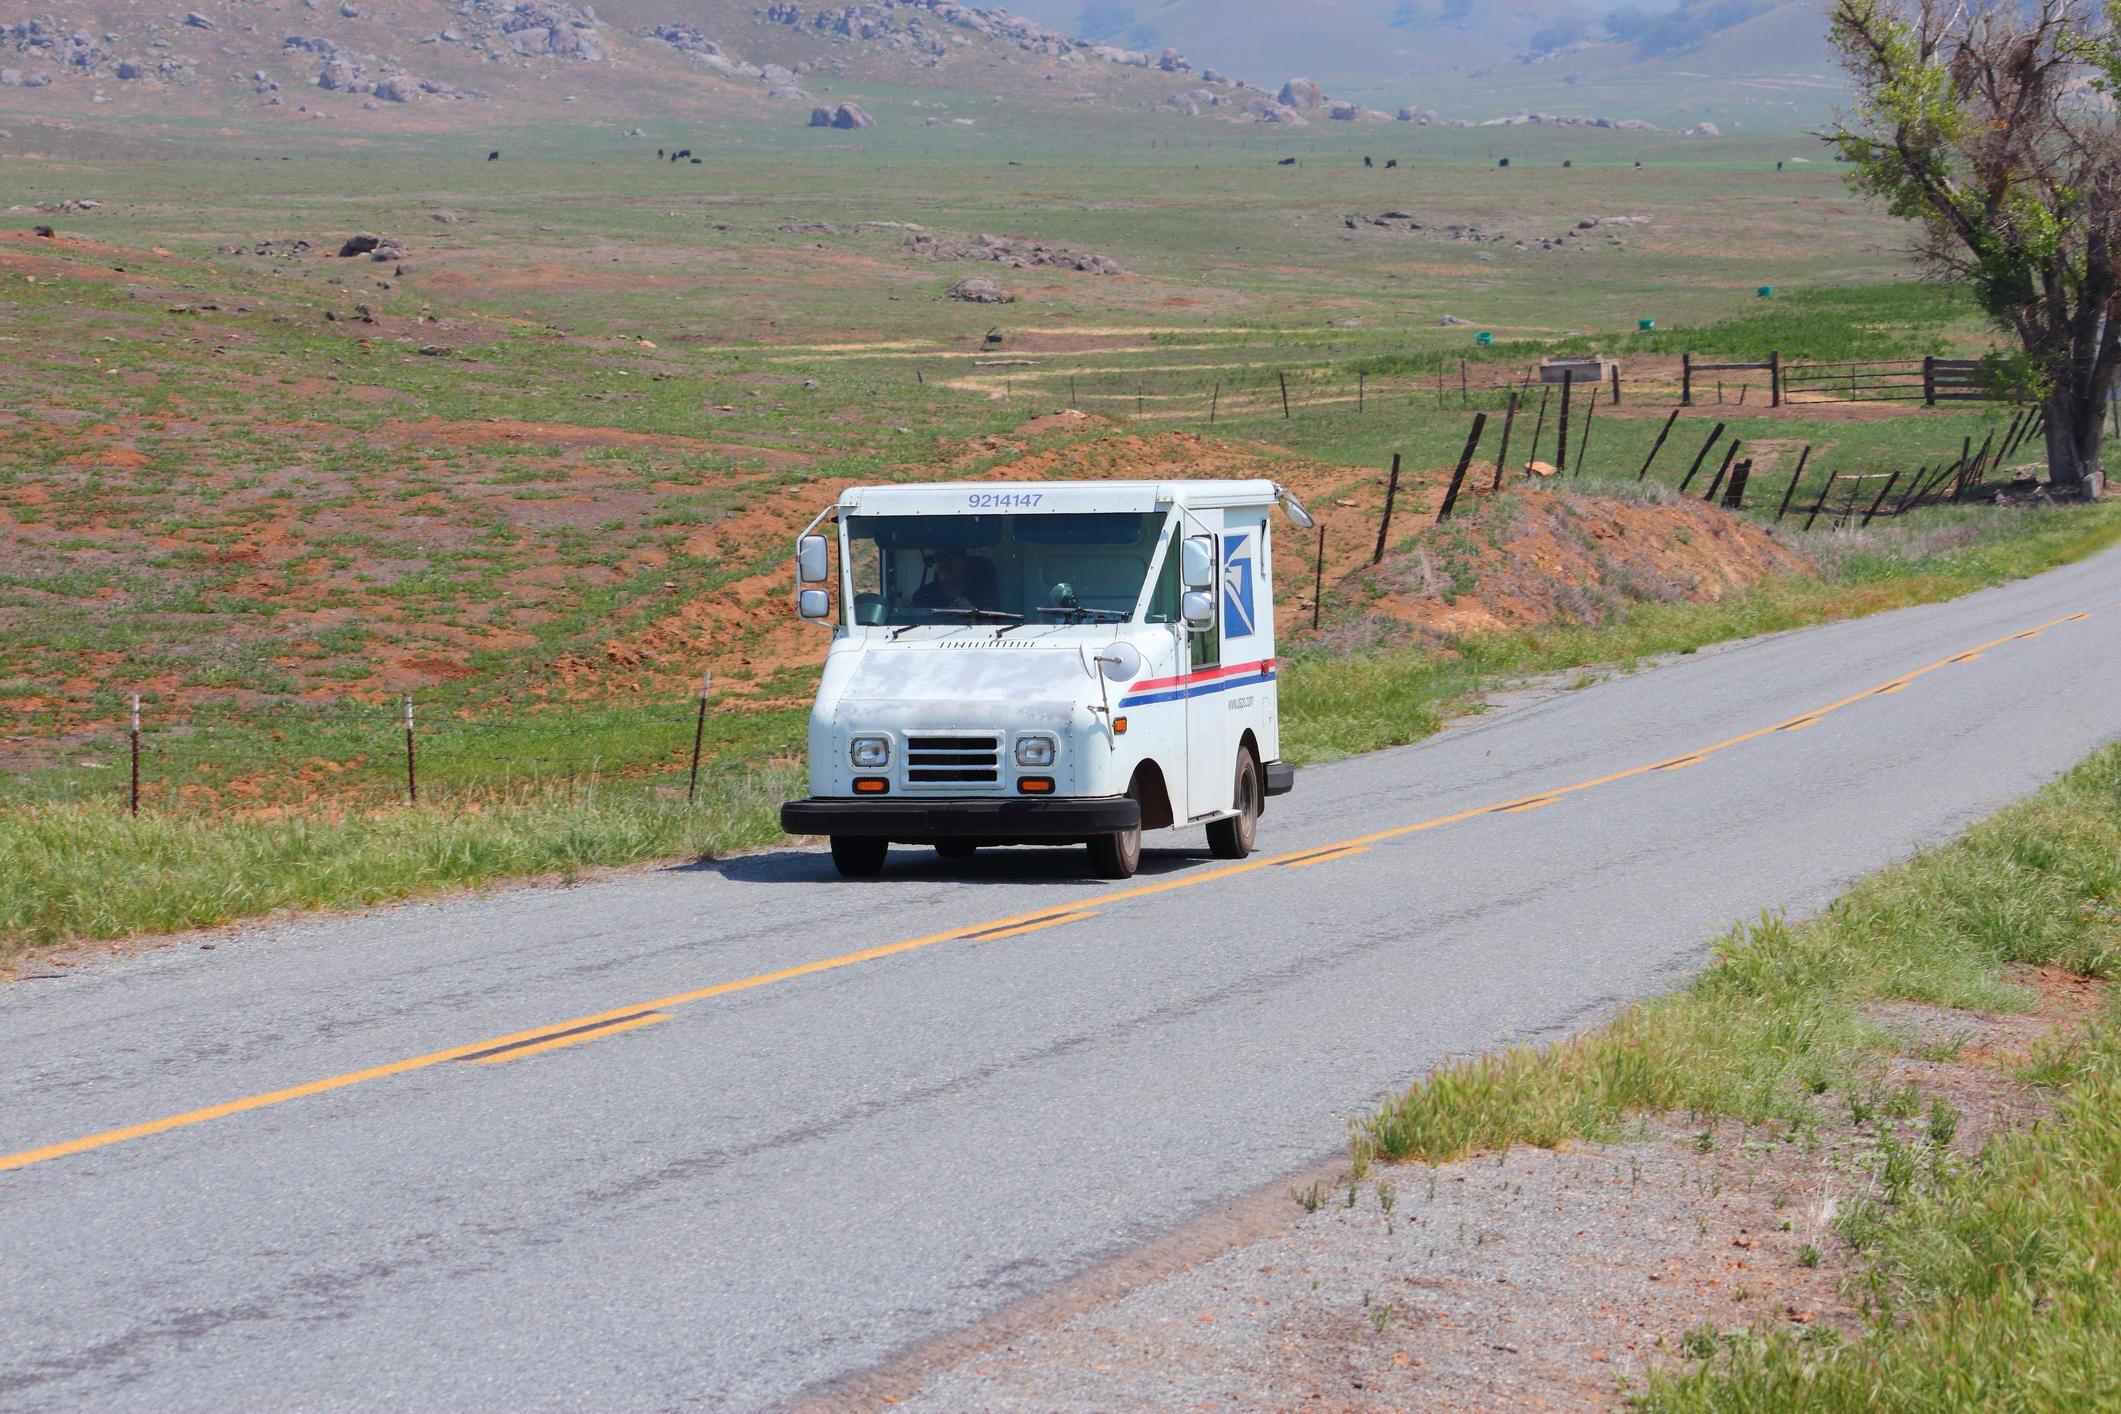 USPS rural licensed tupungato